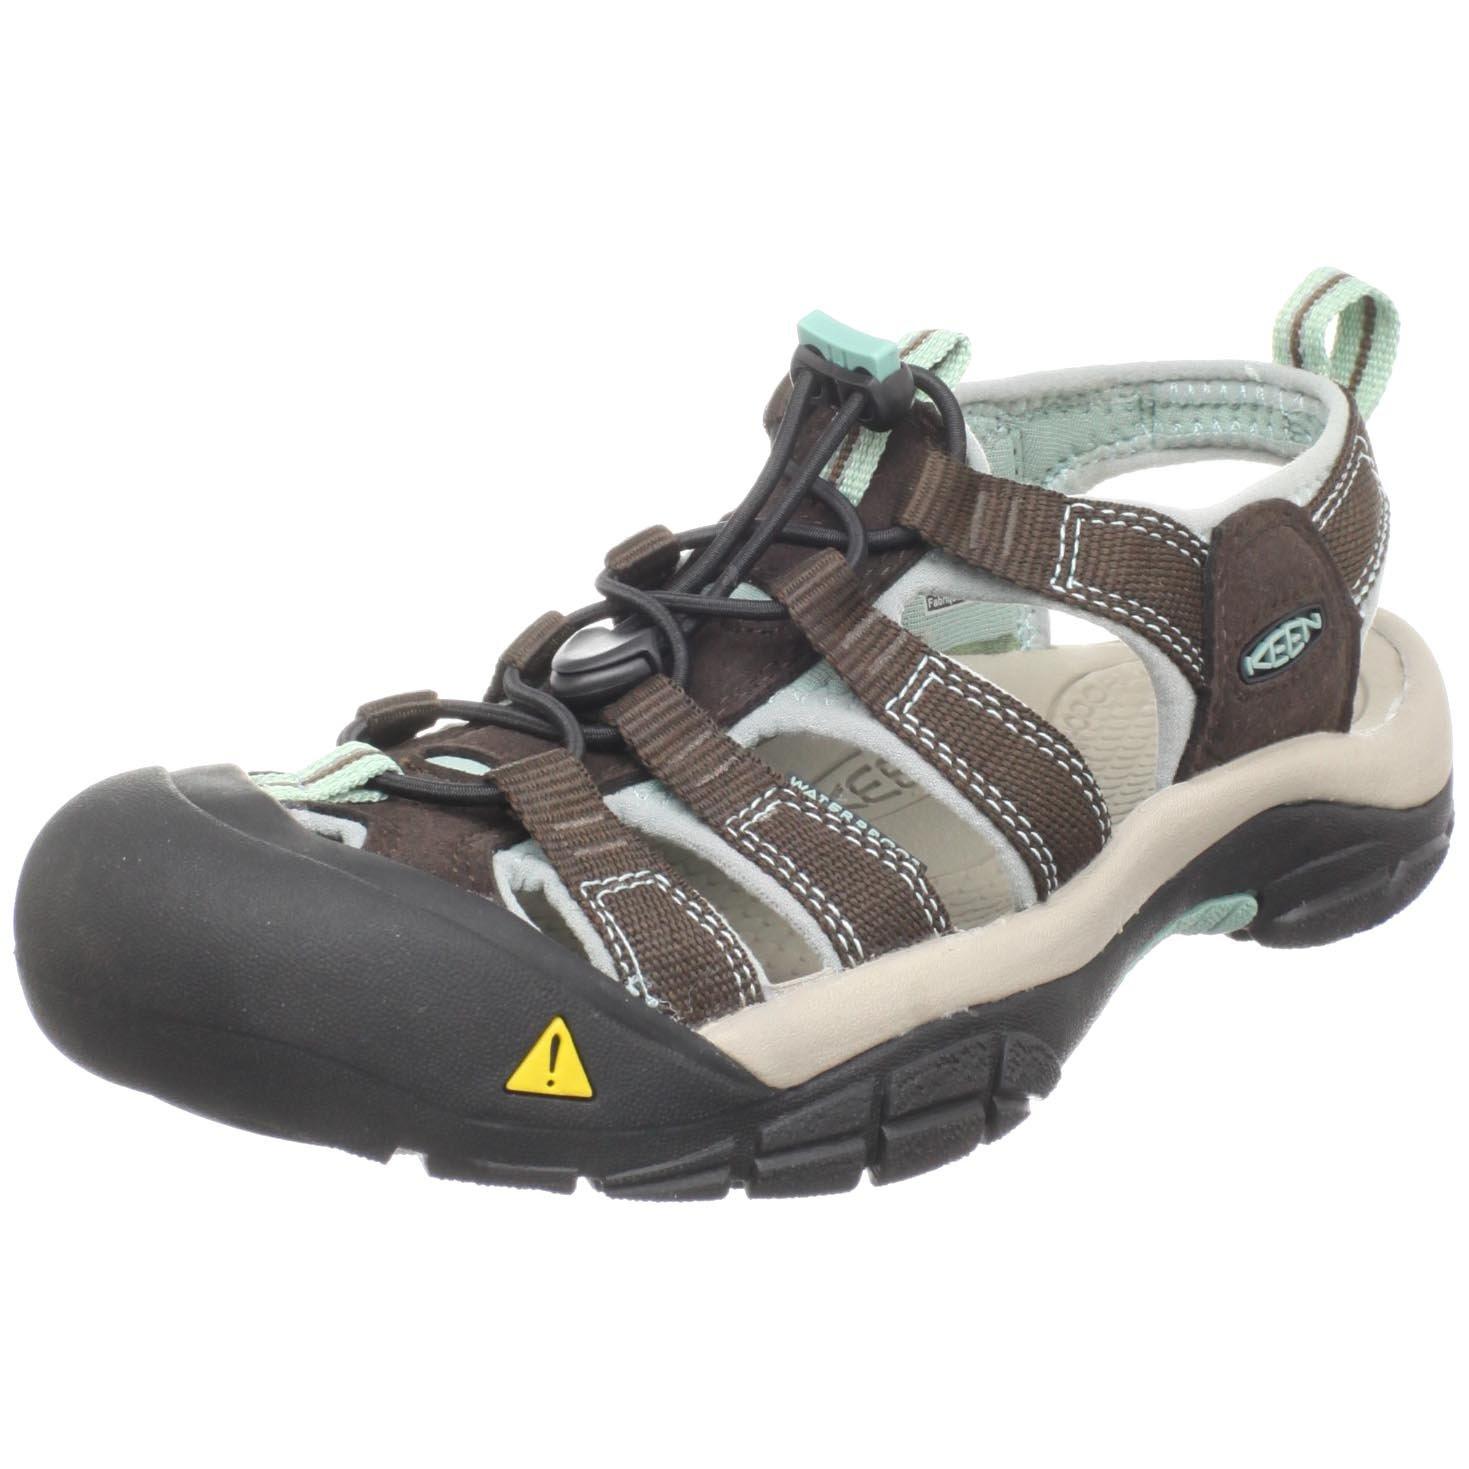 KEEN Women's Newport H2 Sandal B001QB5QVK 8.5 M US|Slate Black/Canton